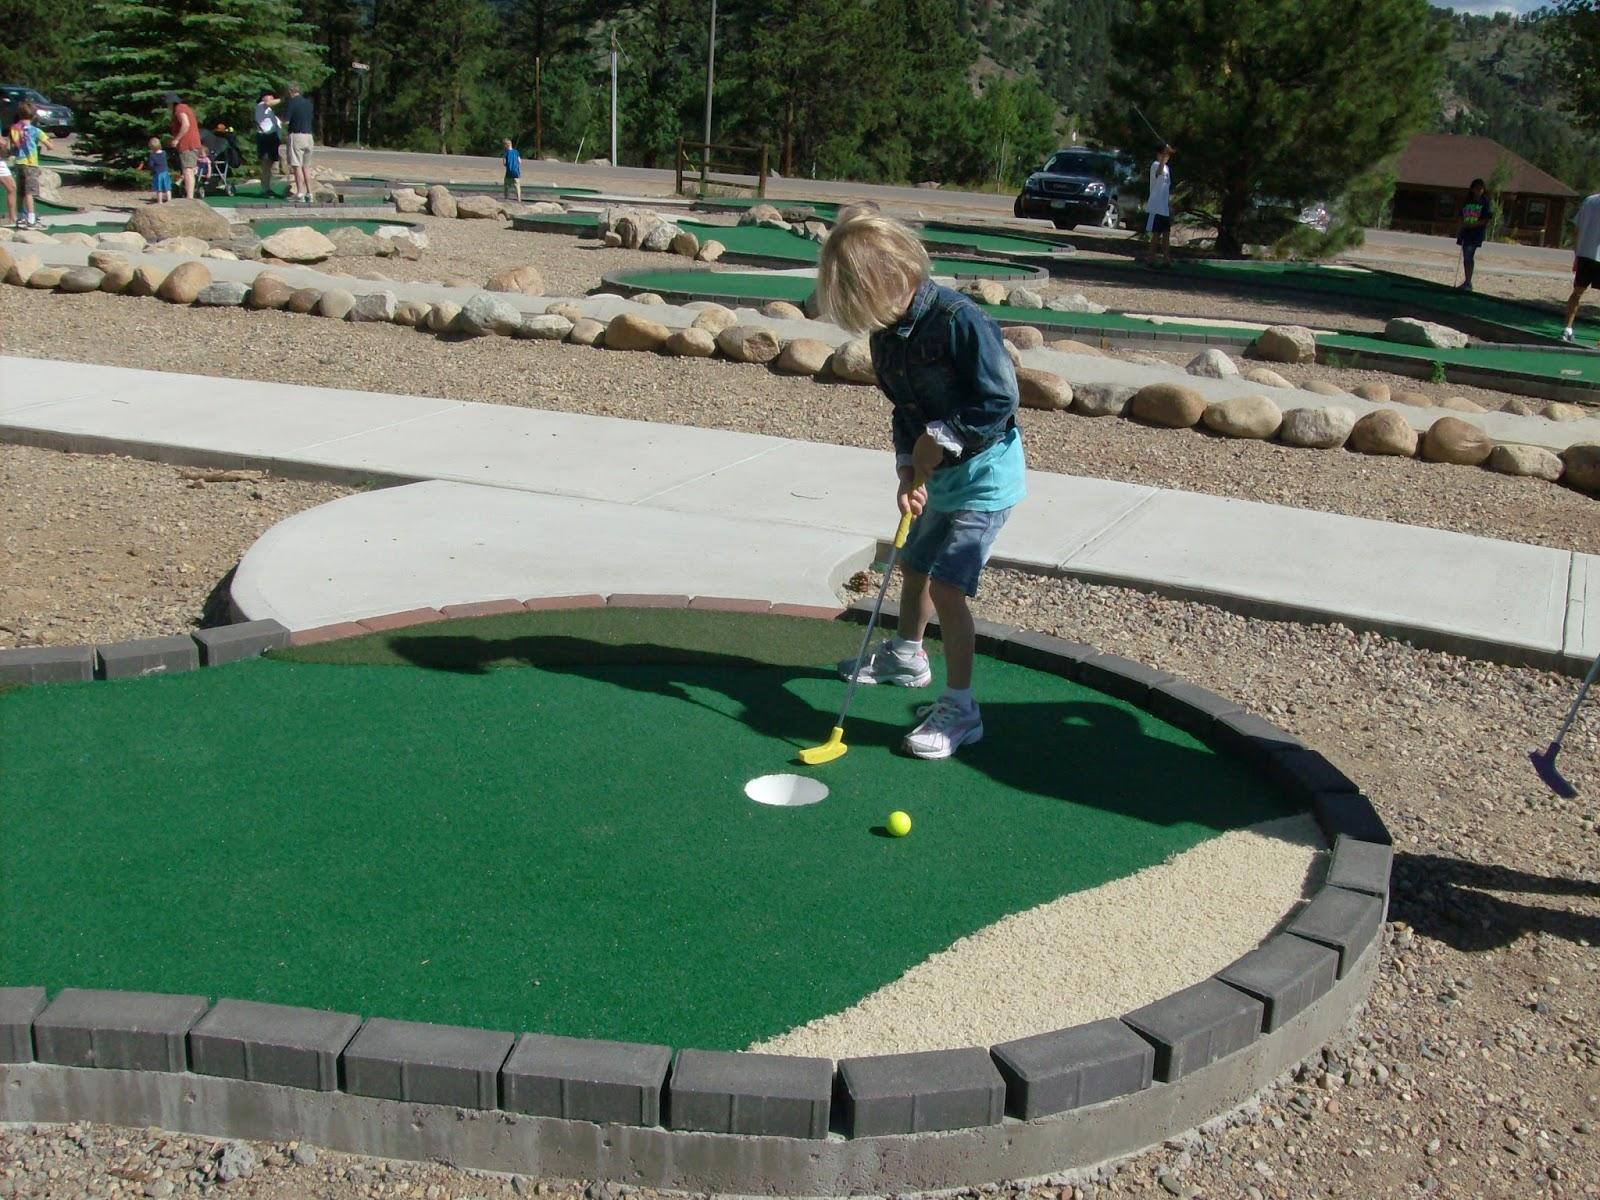 Explore Colorado Ymca Camp Putt Putt Mini Golf Course